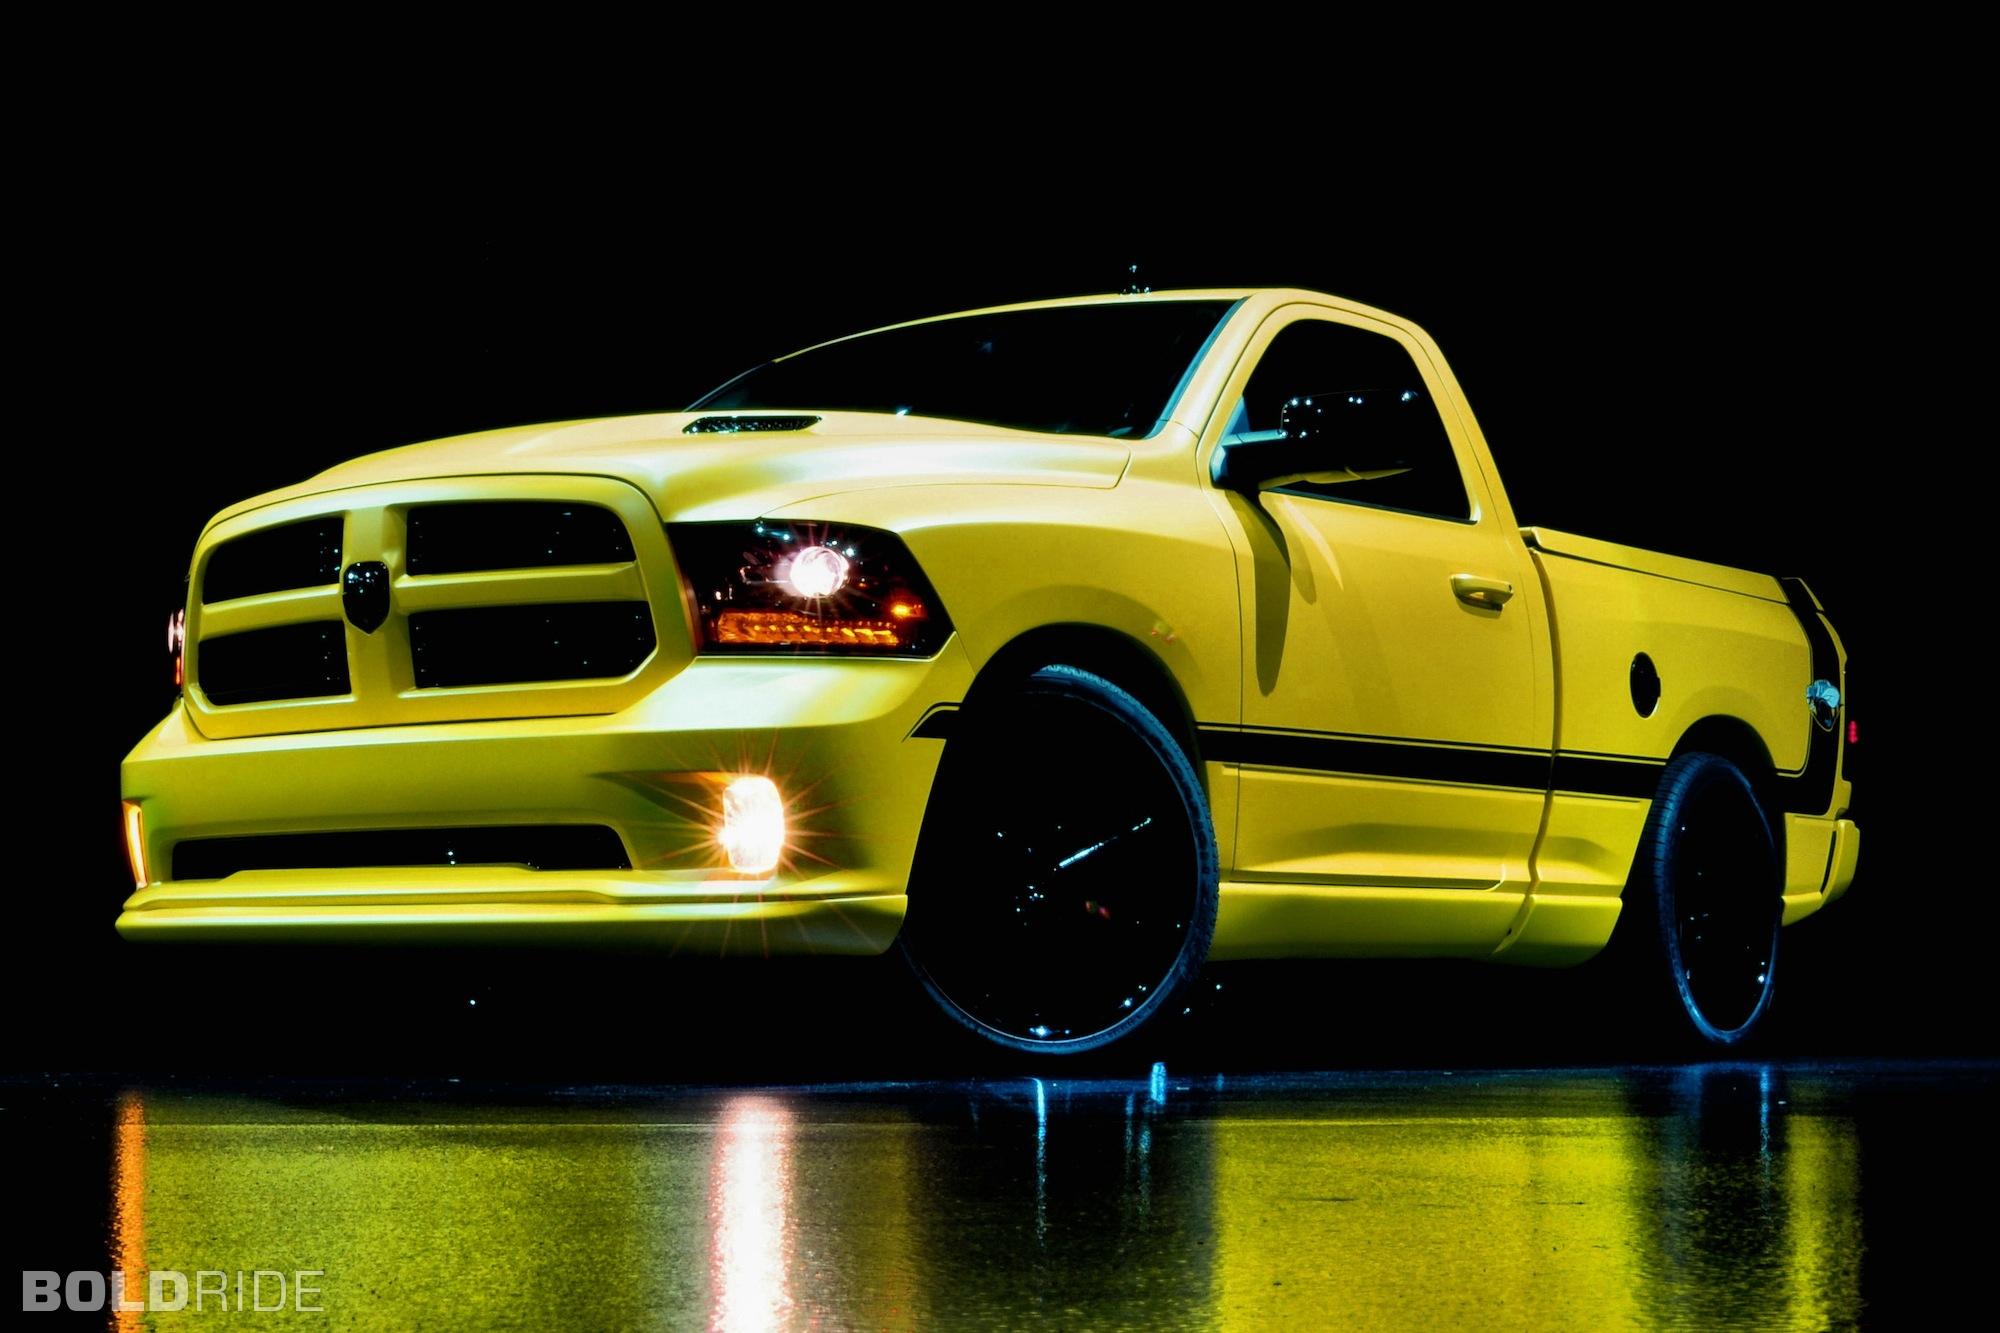 2013 Dodge Ram 1500 Rumble Bee Muscle Concept Pickup Wallpaper 2000x1333 135480 Wallpaperup